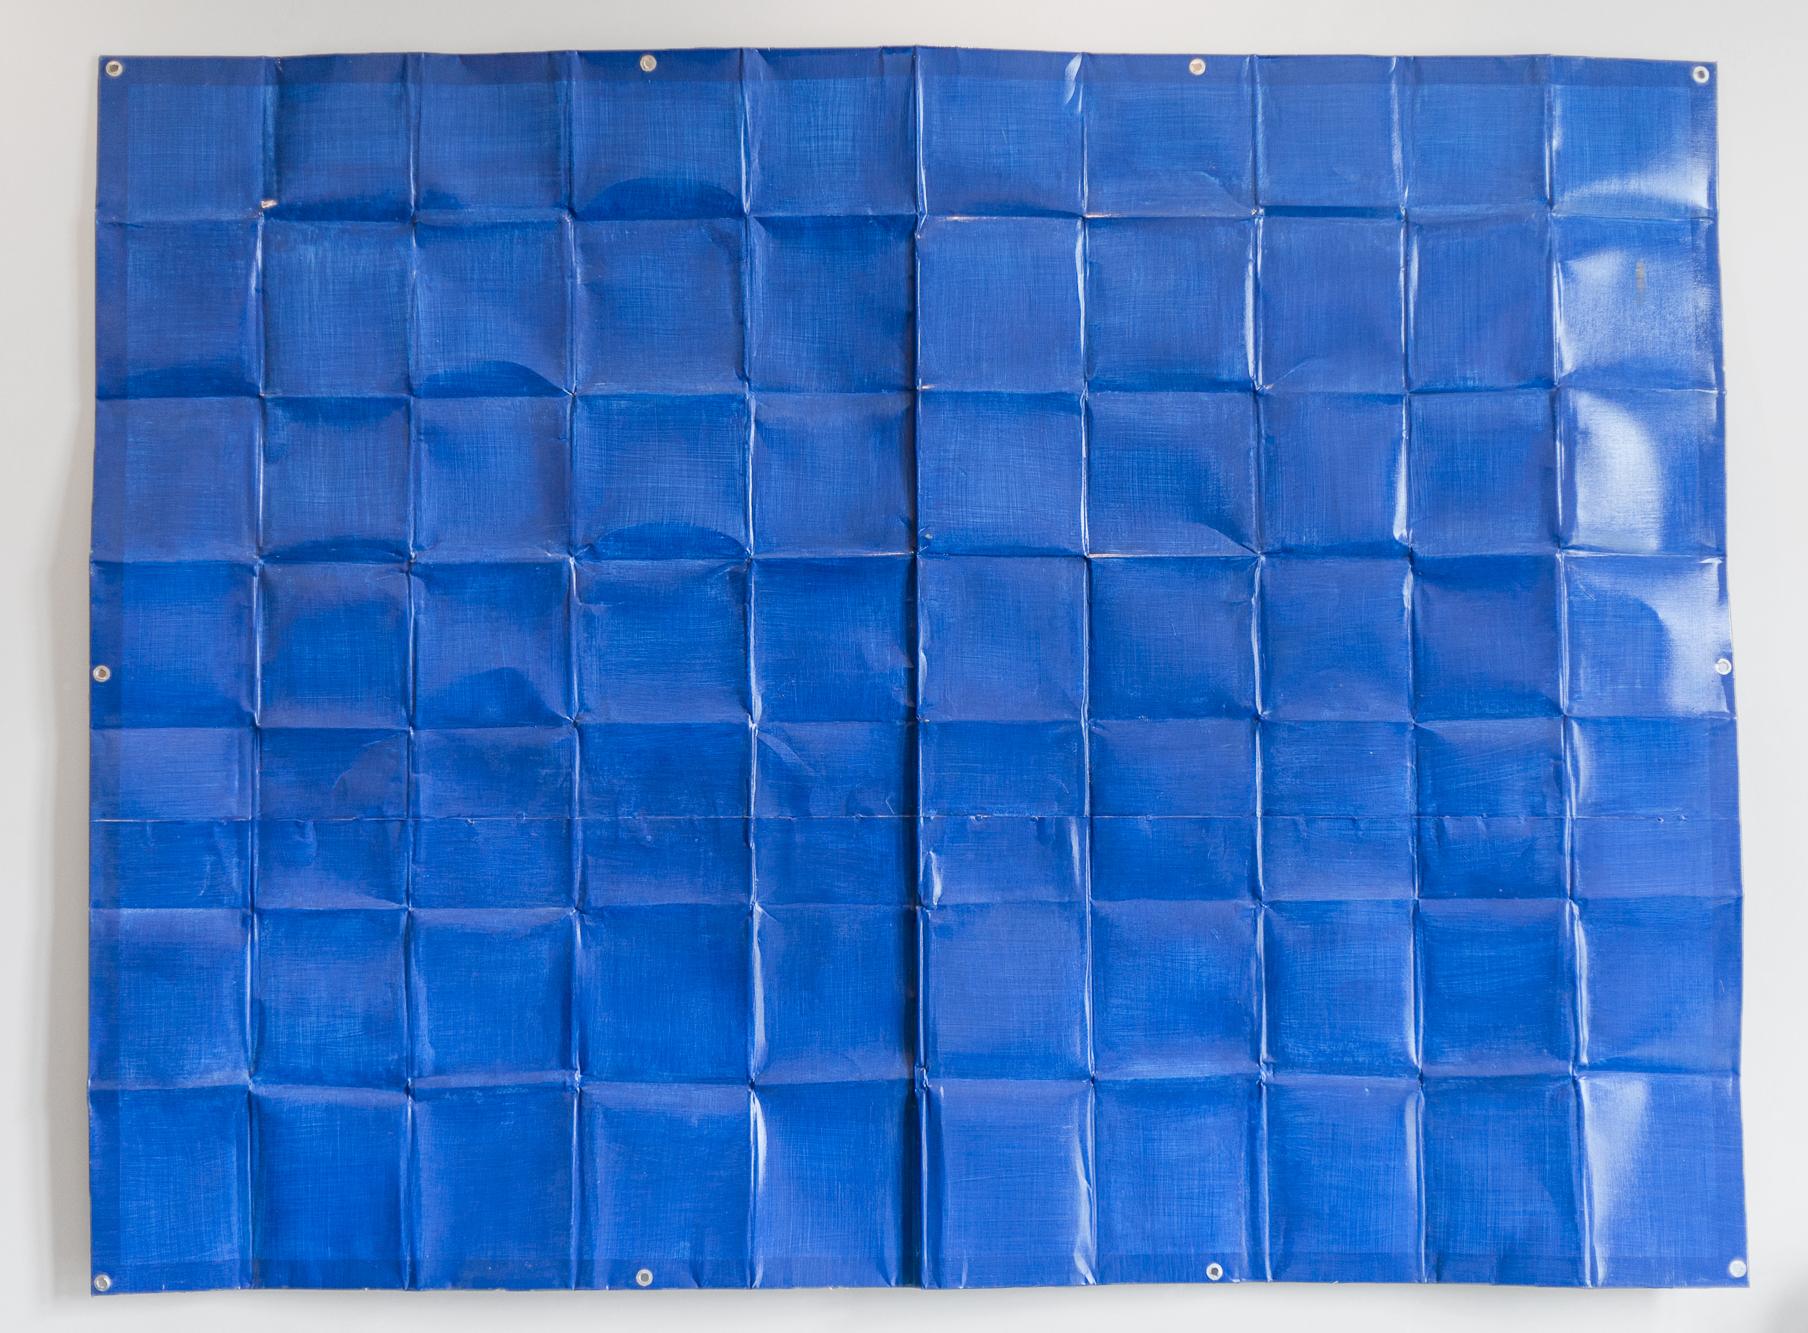 Hamiltonian Gallery_Brian Michael Dunn_Blue Field_2015_acrylic and enamel on steel_96x72in_3500USD.jpg